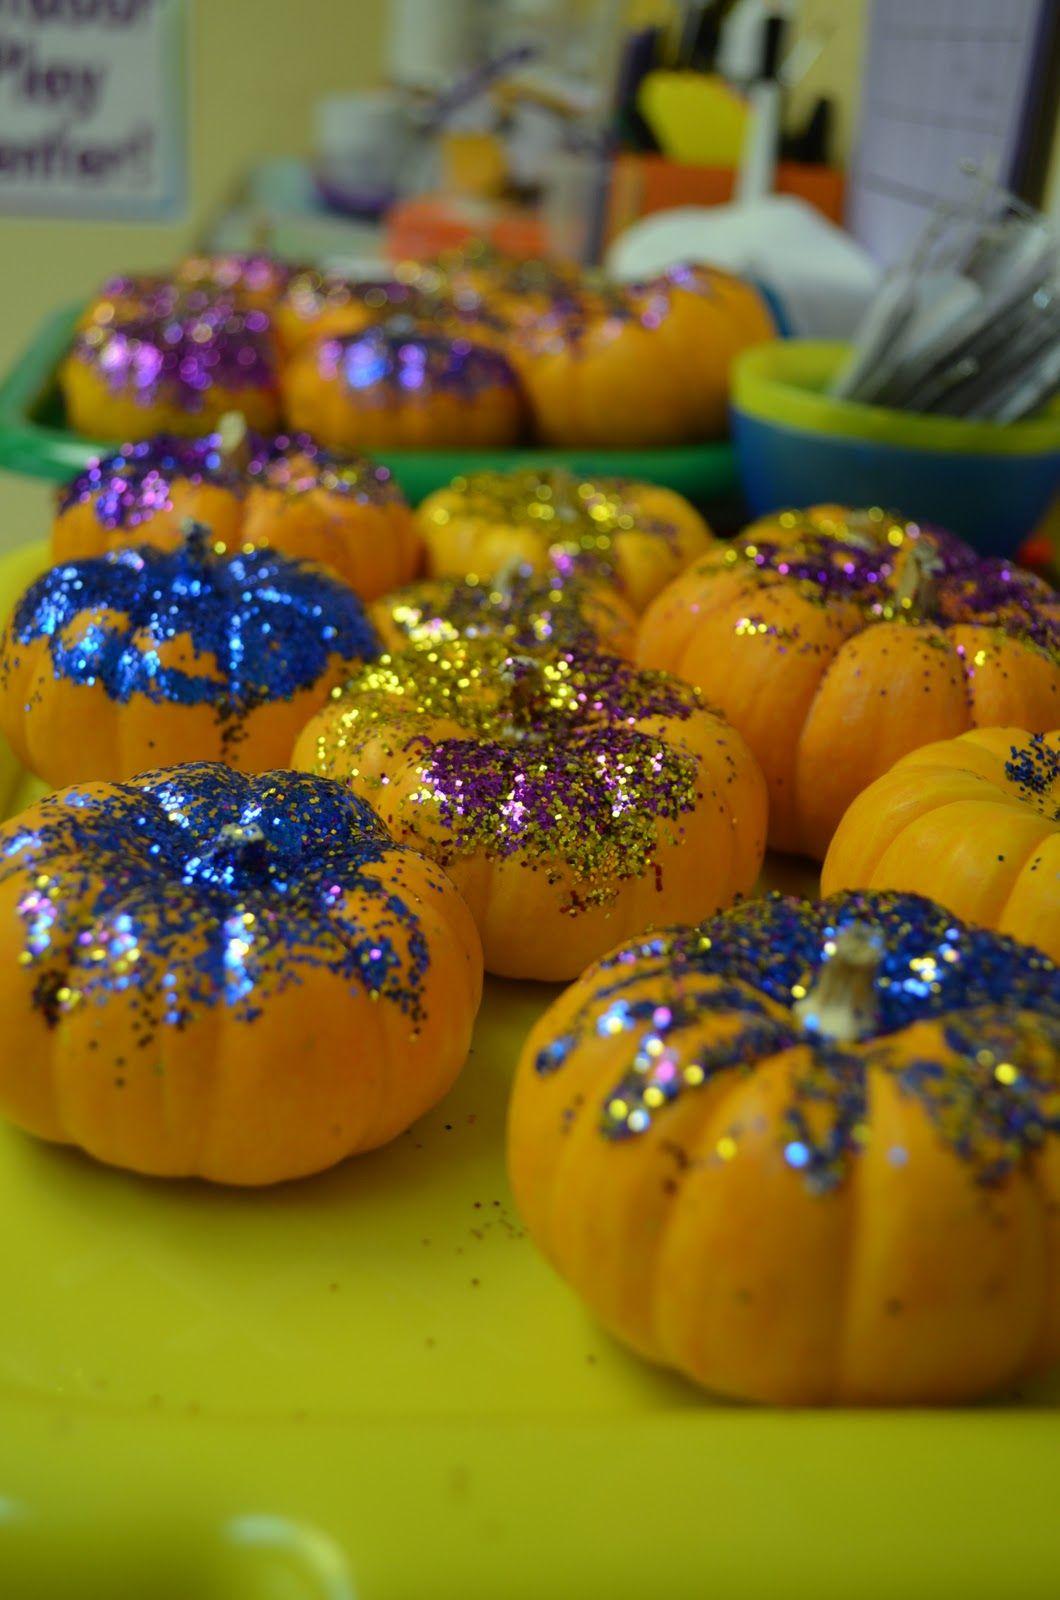 preschool ideas for 2 year olds halloween fun - Halloween Preschool Ideas